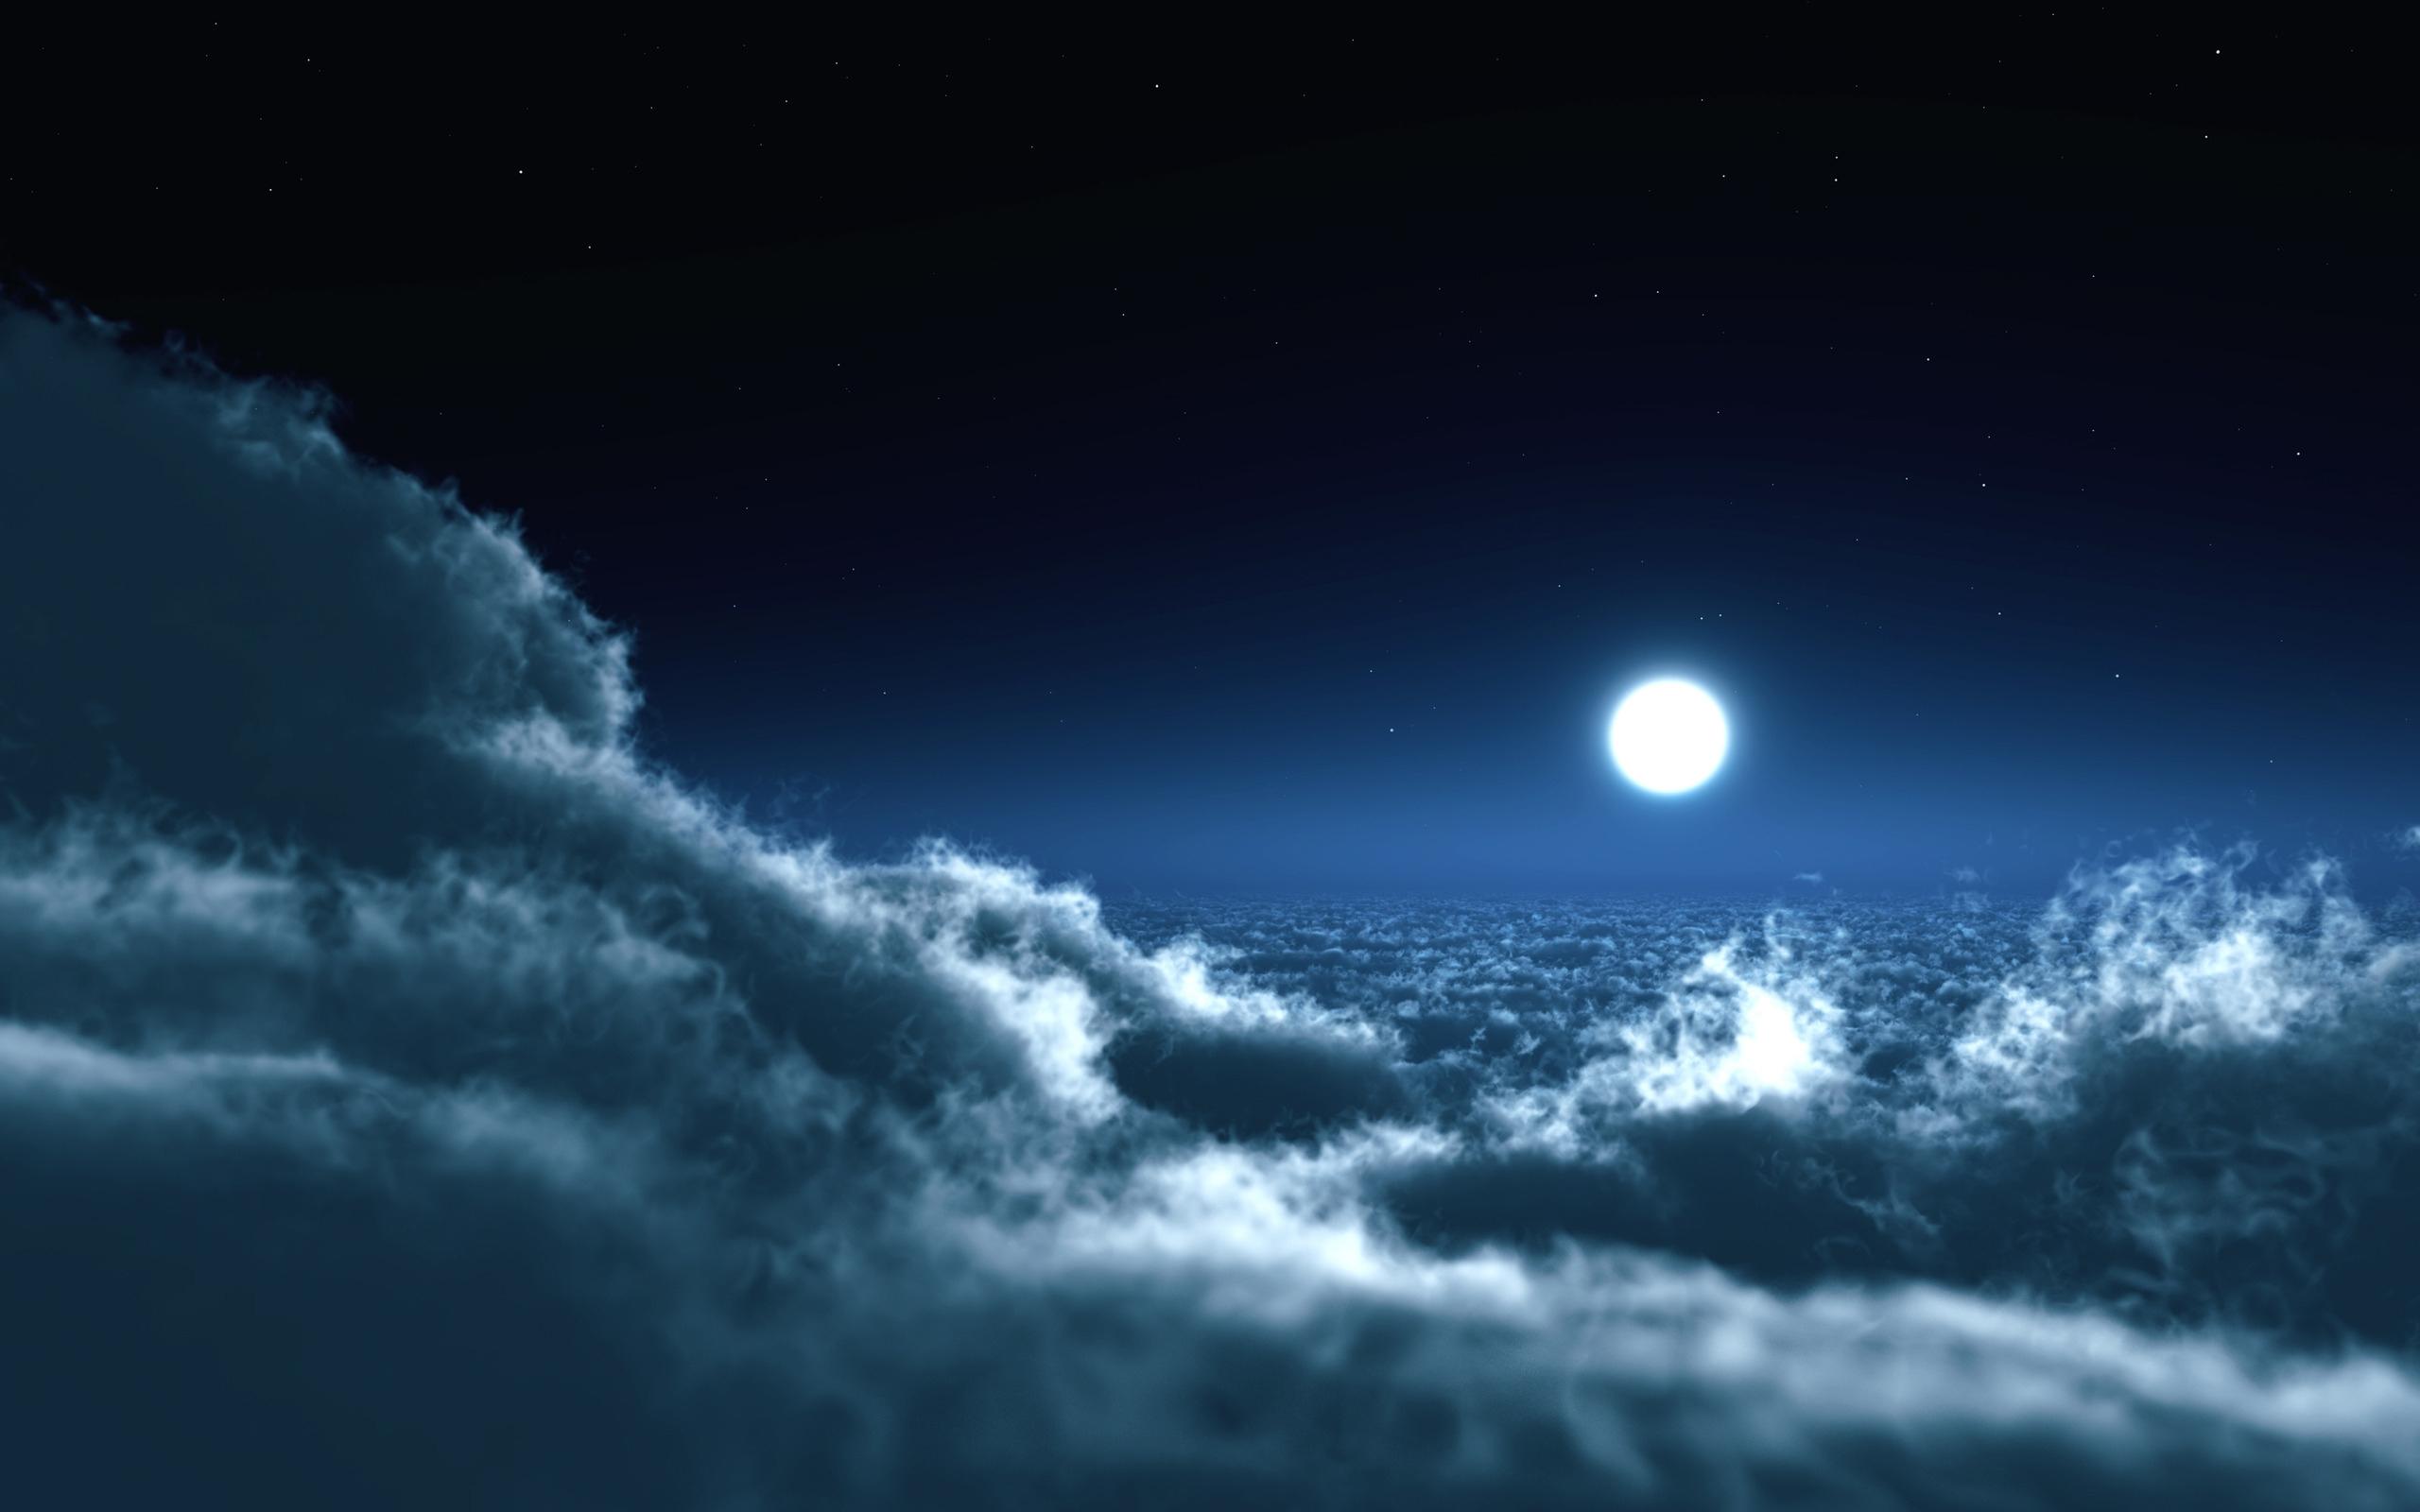 cloud wallpaper night